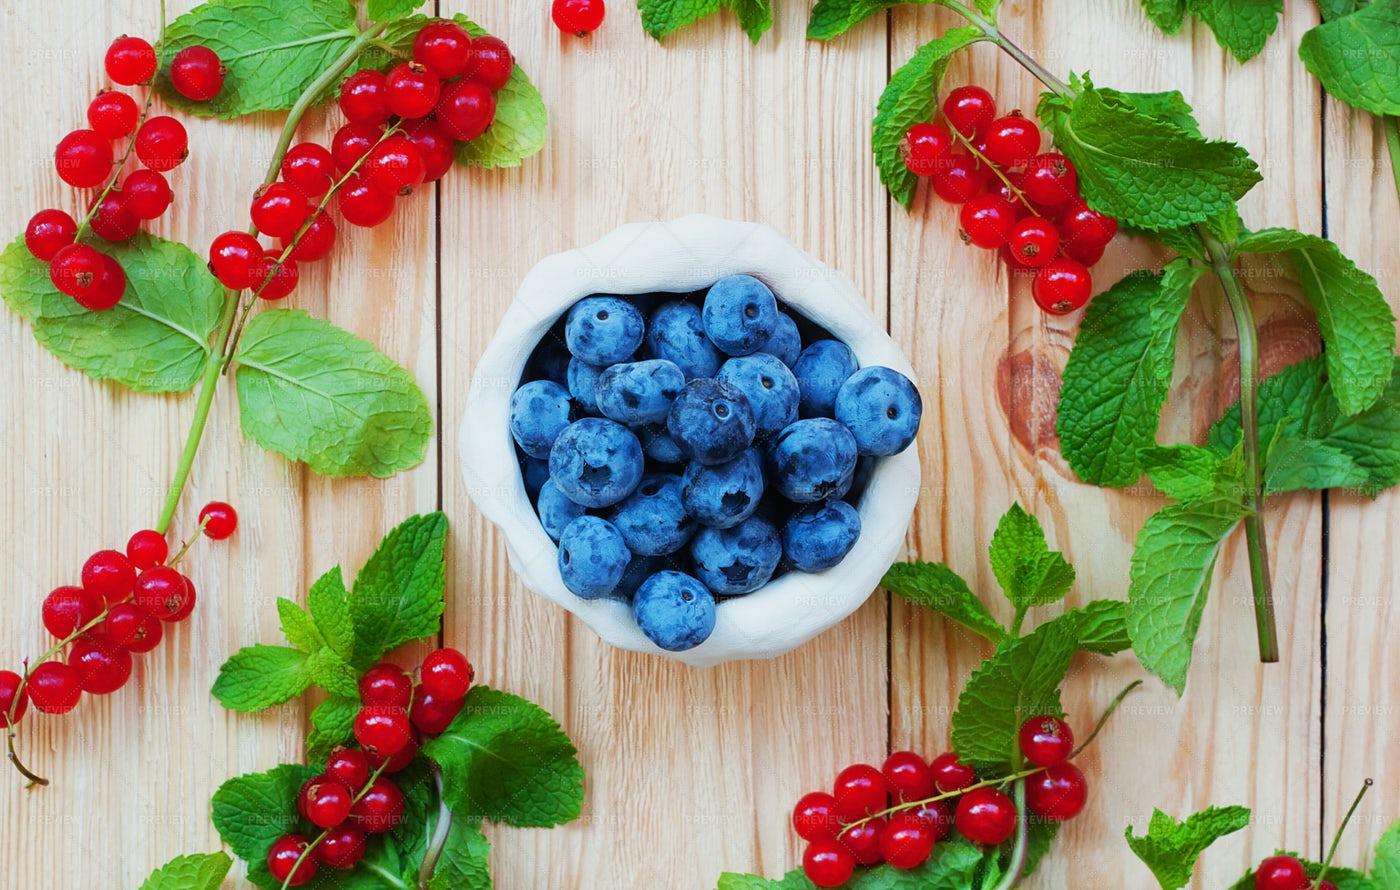 Fruits On Wood: Stock Photos